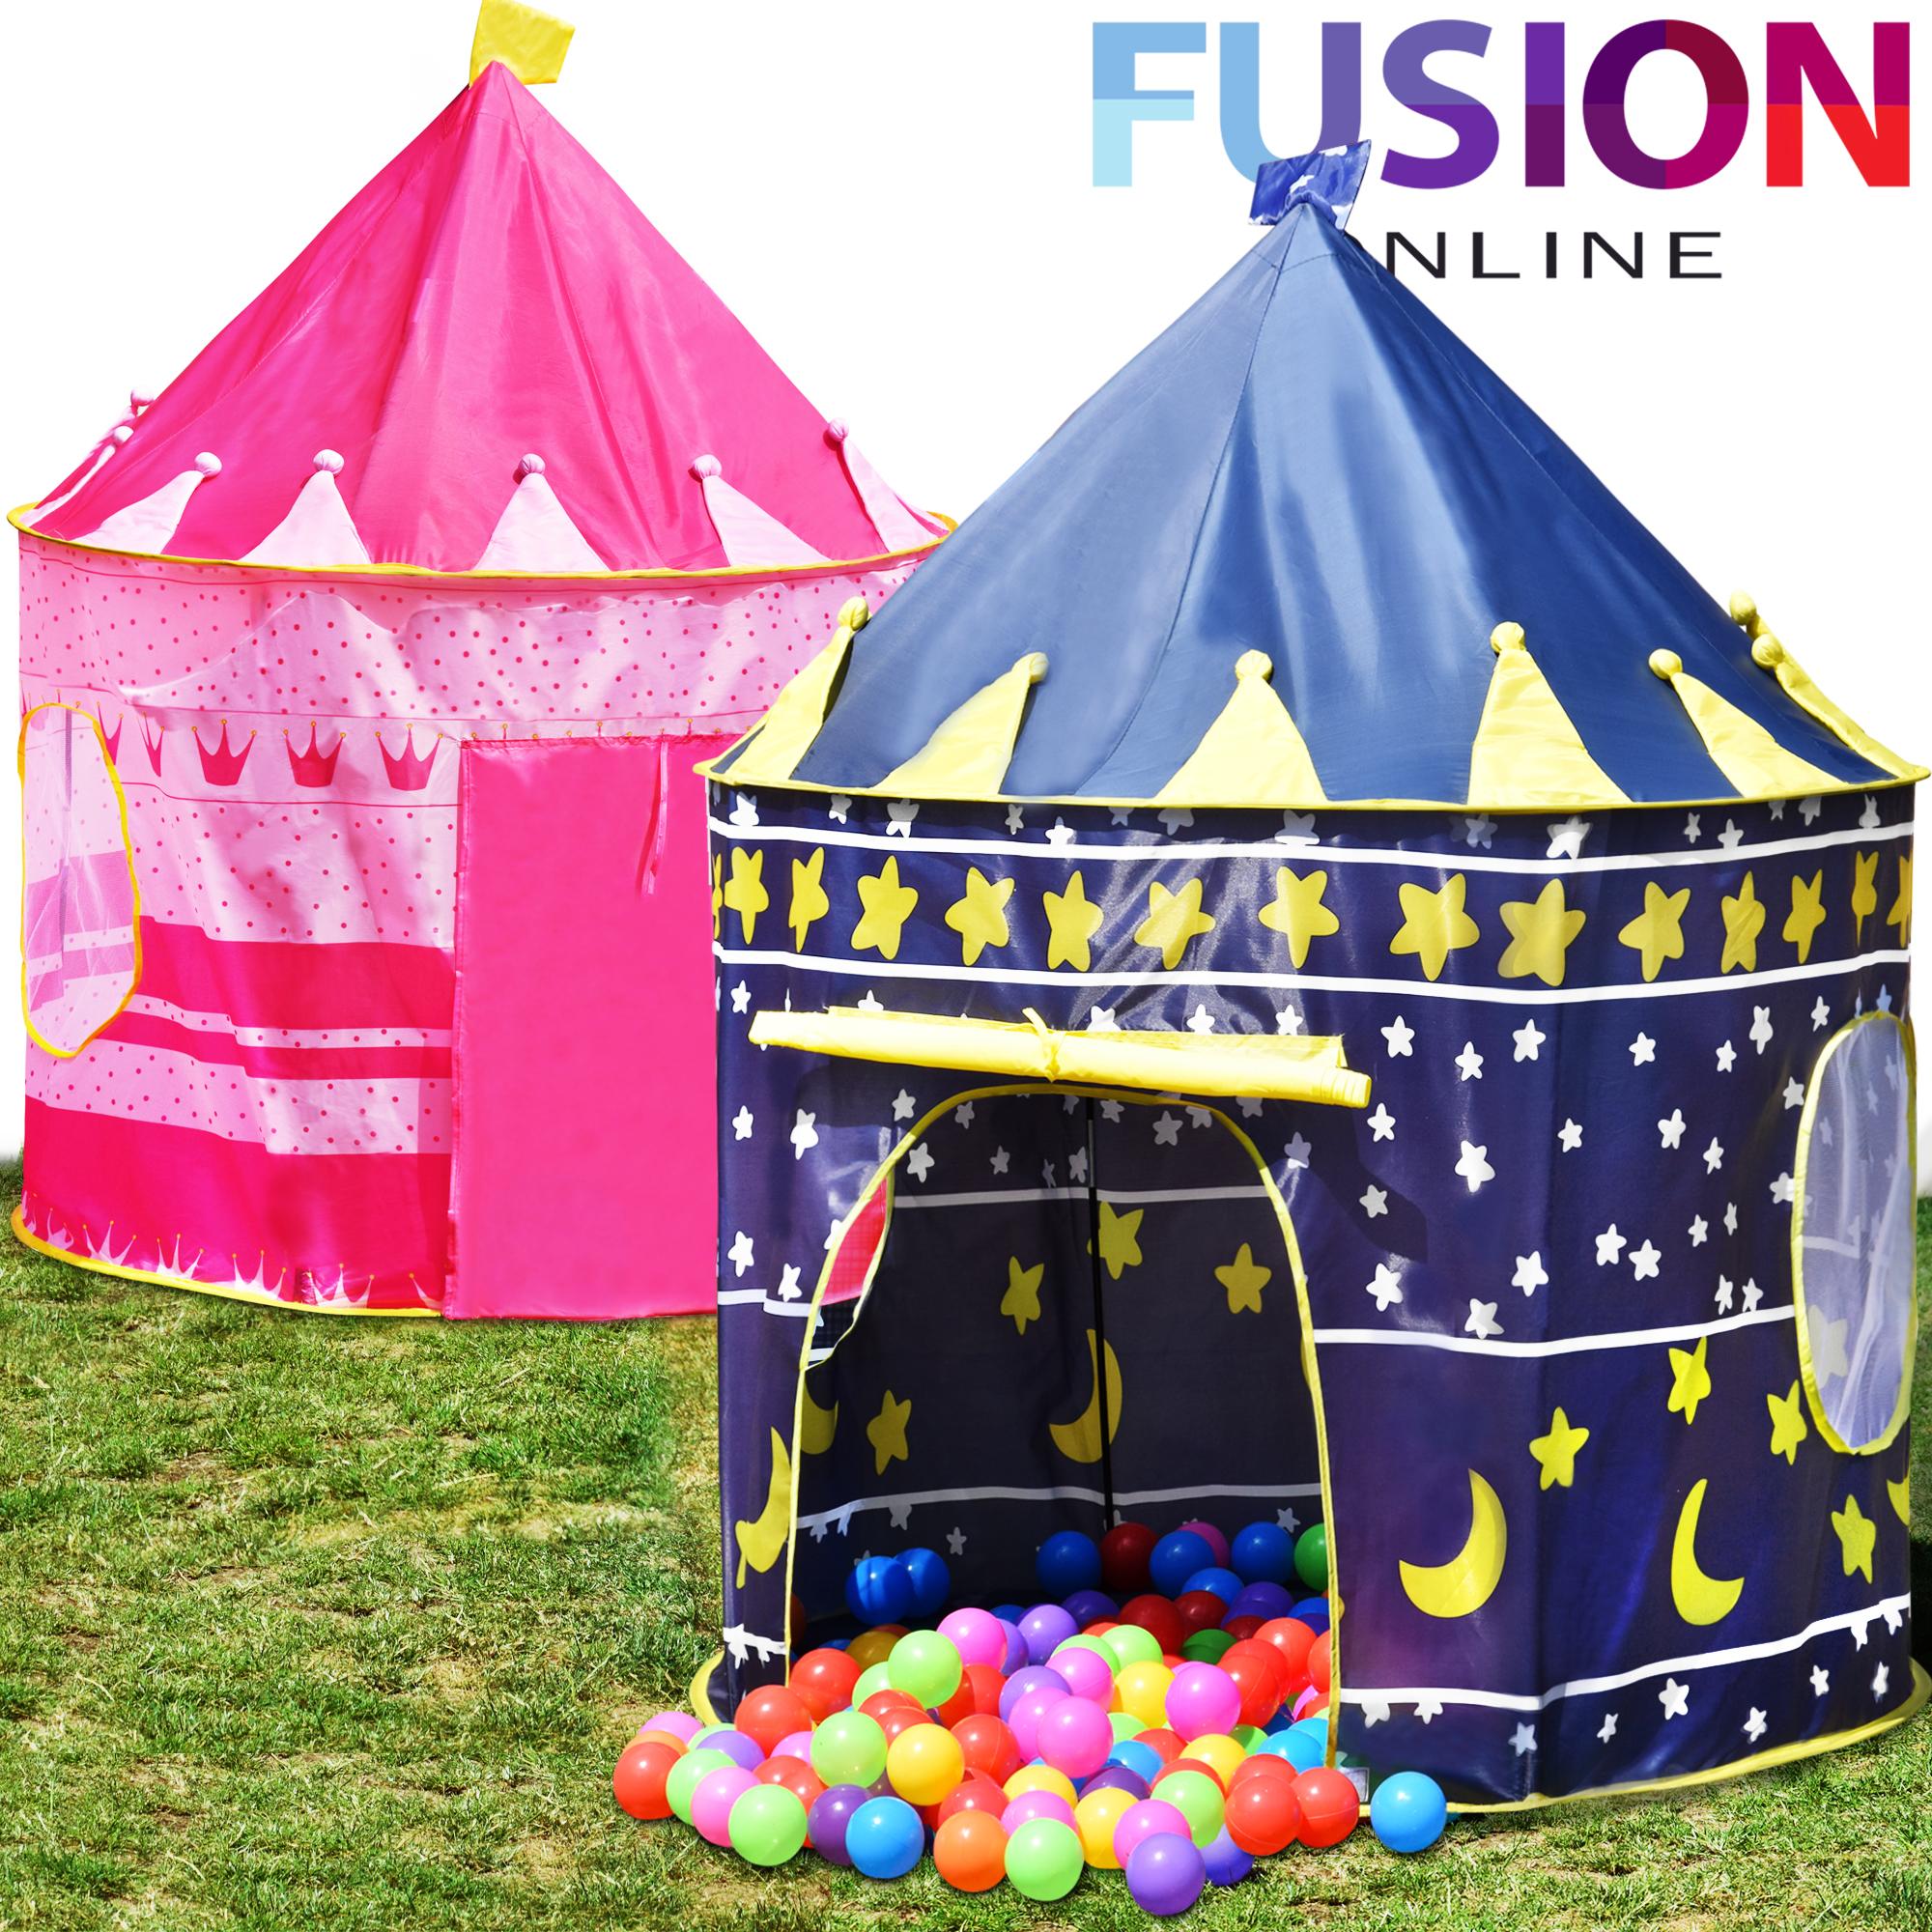 Details about Childrens Kids Pop Up Castle Playhouse Girls Princess / Boys Wizard - Play Tent  sc 1 st  eBay & Childrens Kids Pop Up Castle Playhouse Girls Princess / Boys Wizard ...